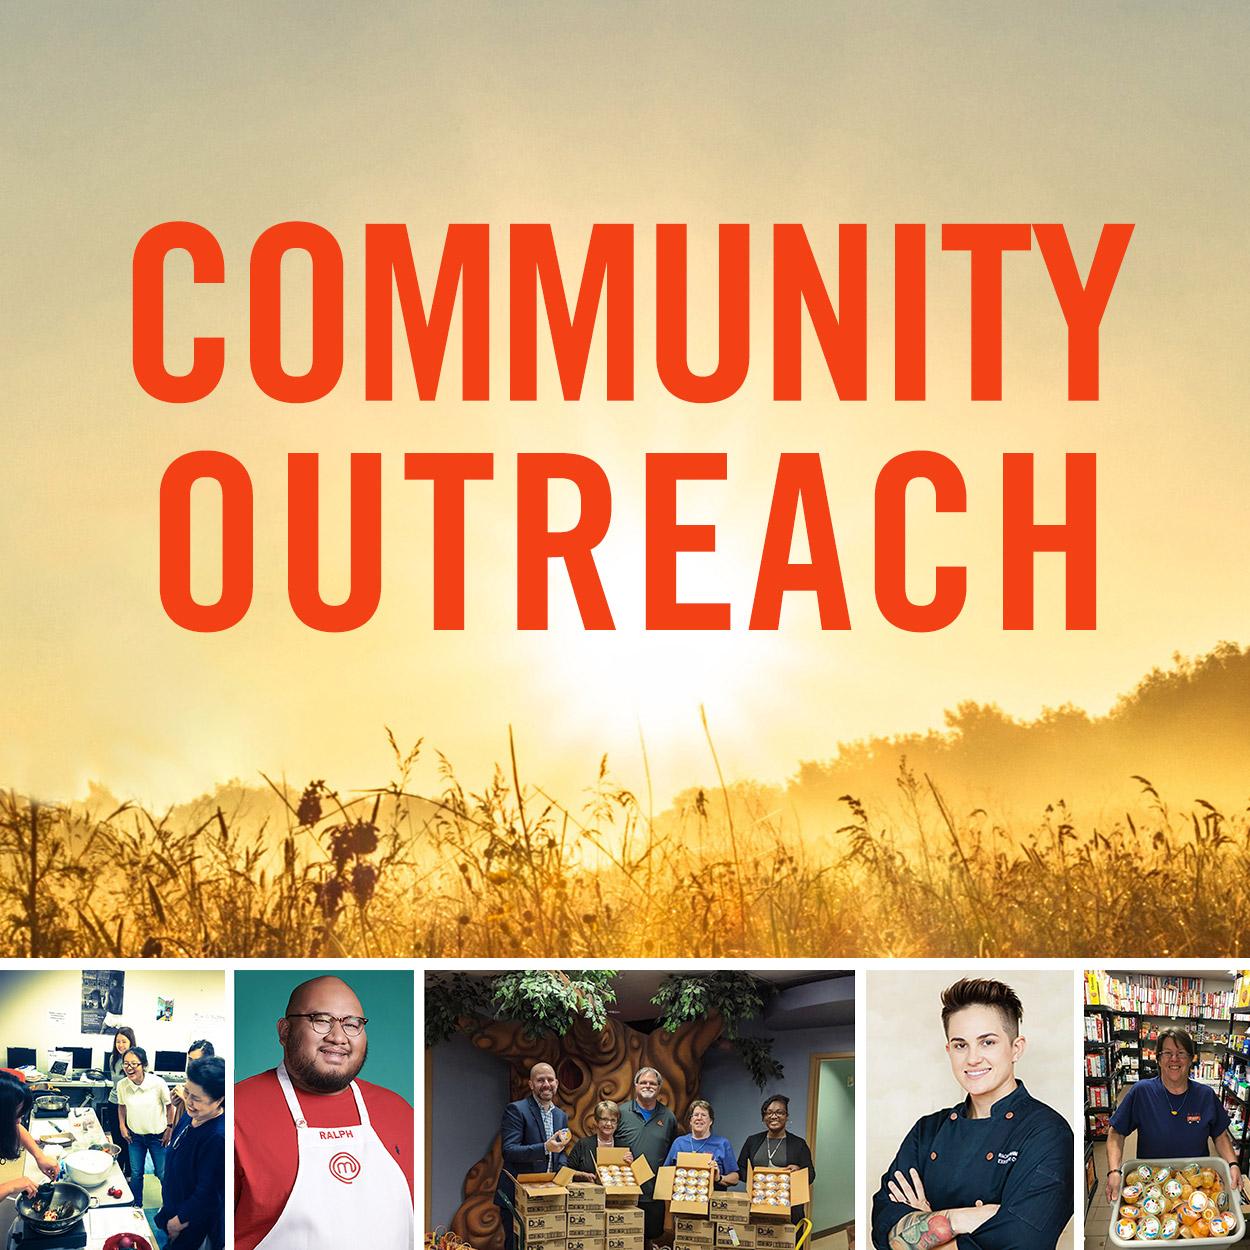 DOLE Community Outreach